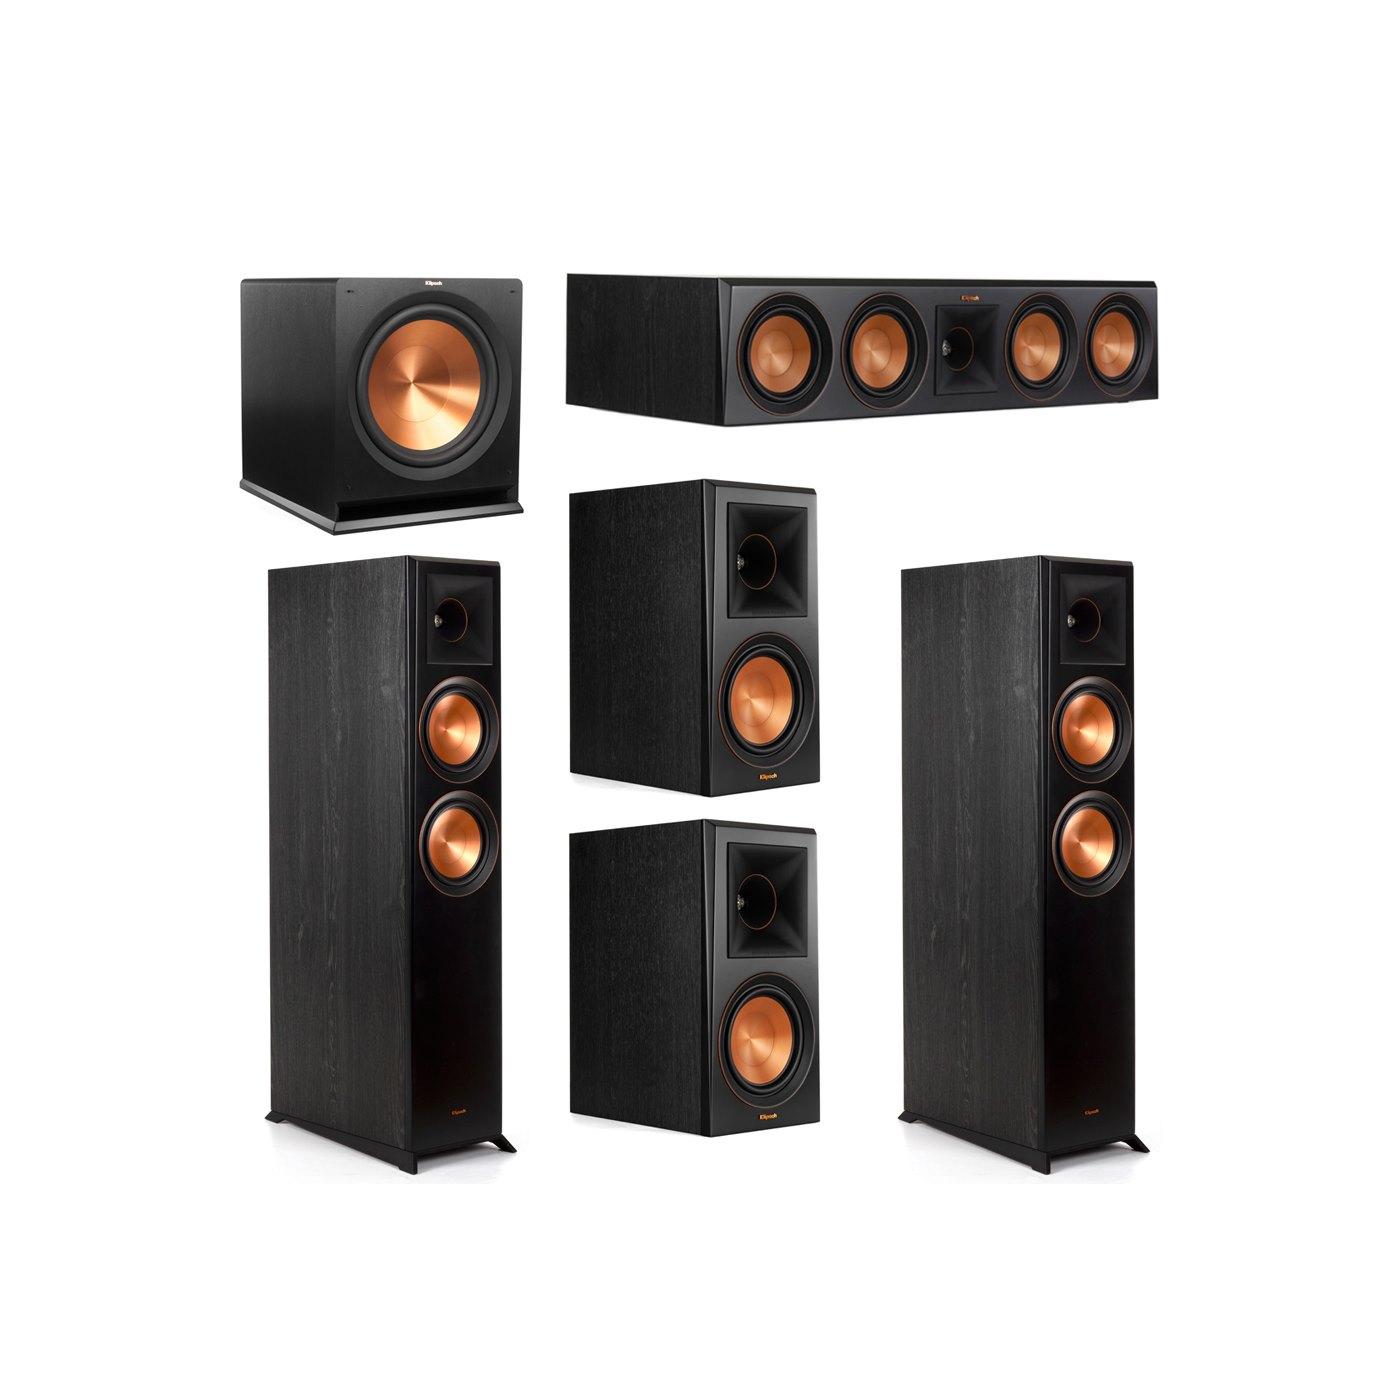 Klipsch 5.1 System with 2 RP-6000F Floorstanding Speakers, 1 Klipsch RP-504C Center Speaker, 2 Klipsch RP-600M Surround Speakers, 1 Klipsch R-115SW Subwoofer